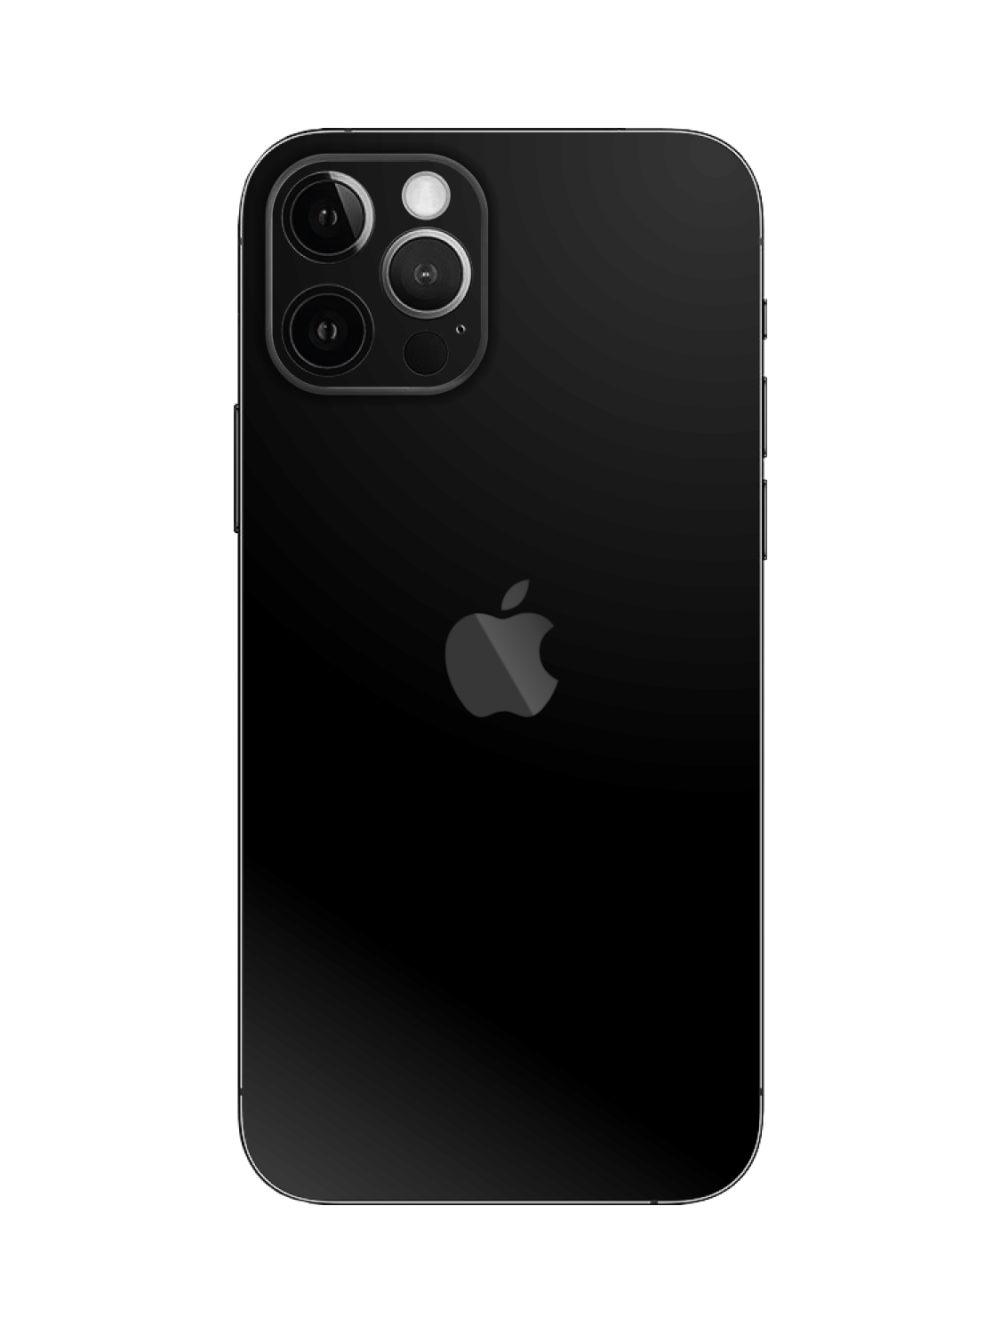 Apple iPhone 12 Pro Max Matte Vinyl Skin Wrap